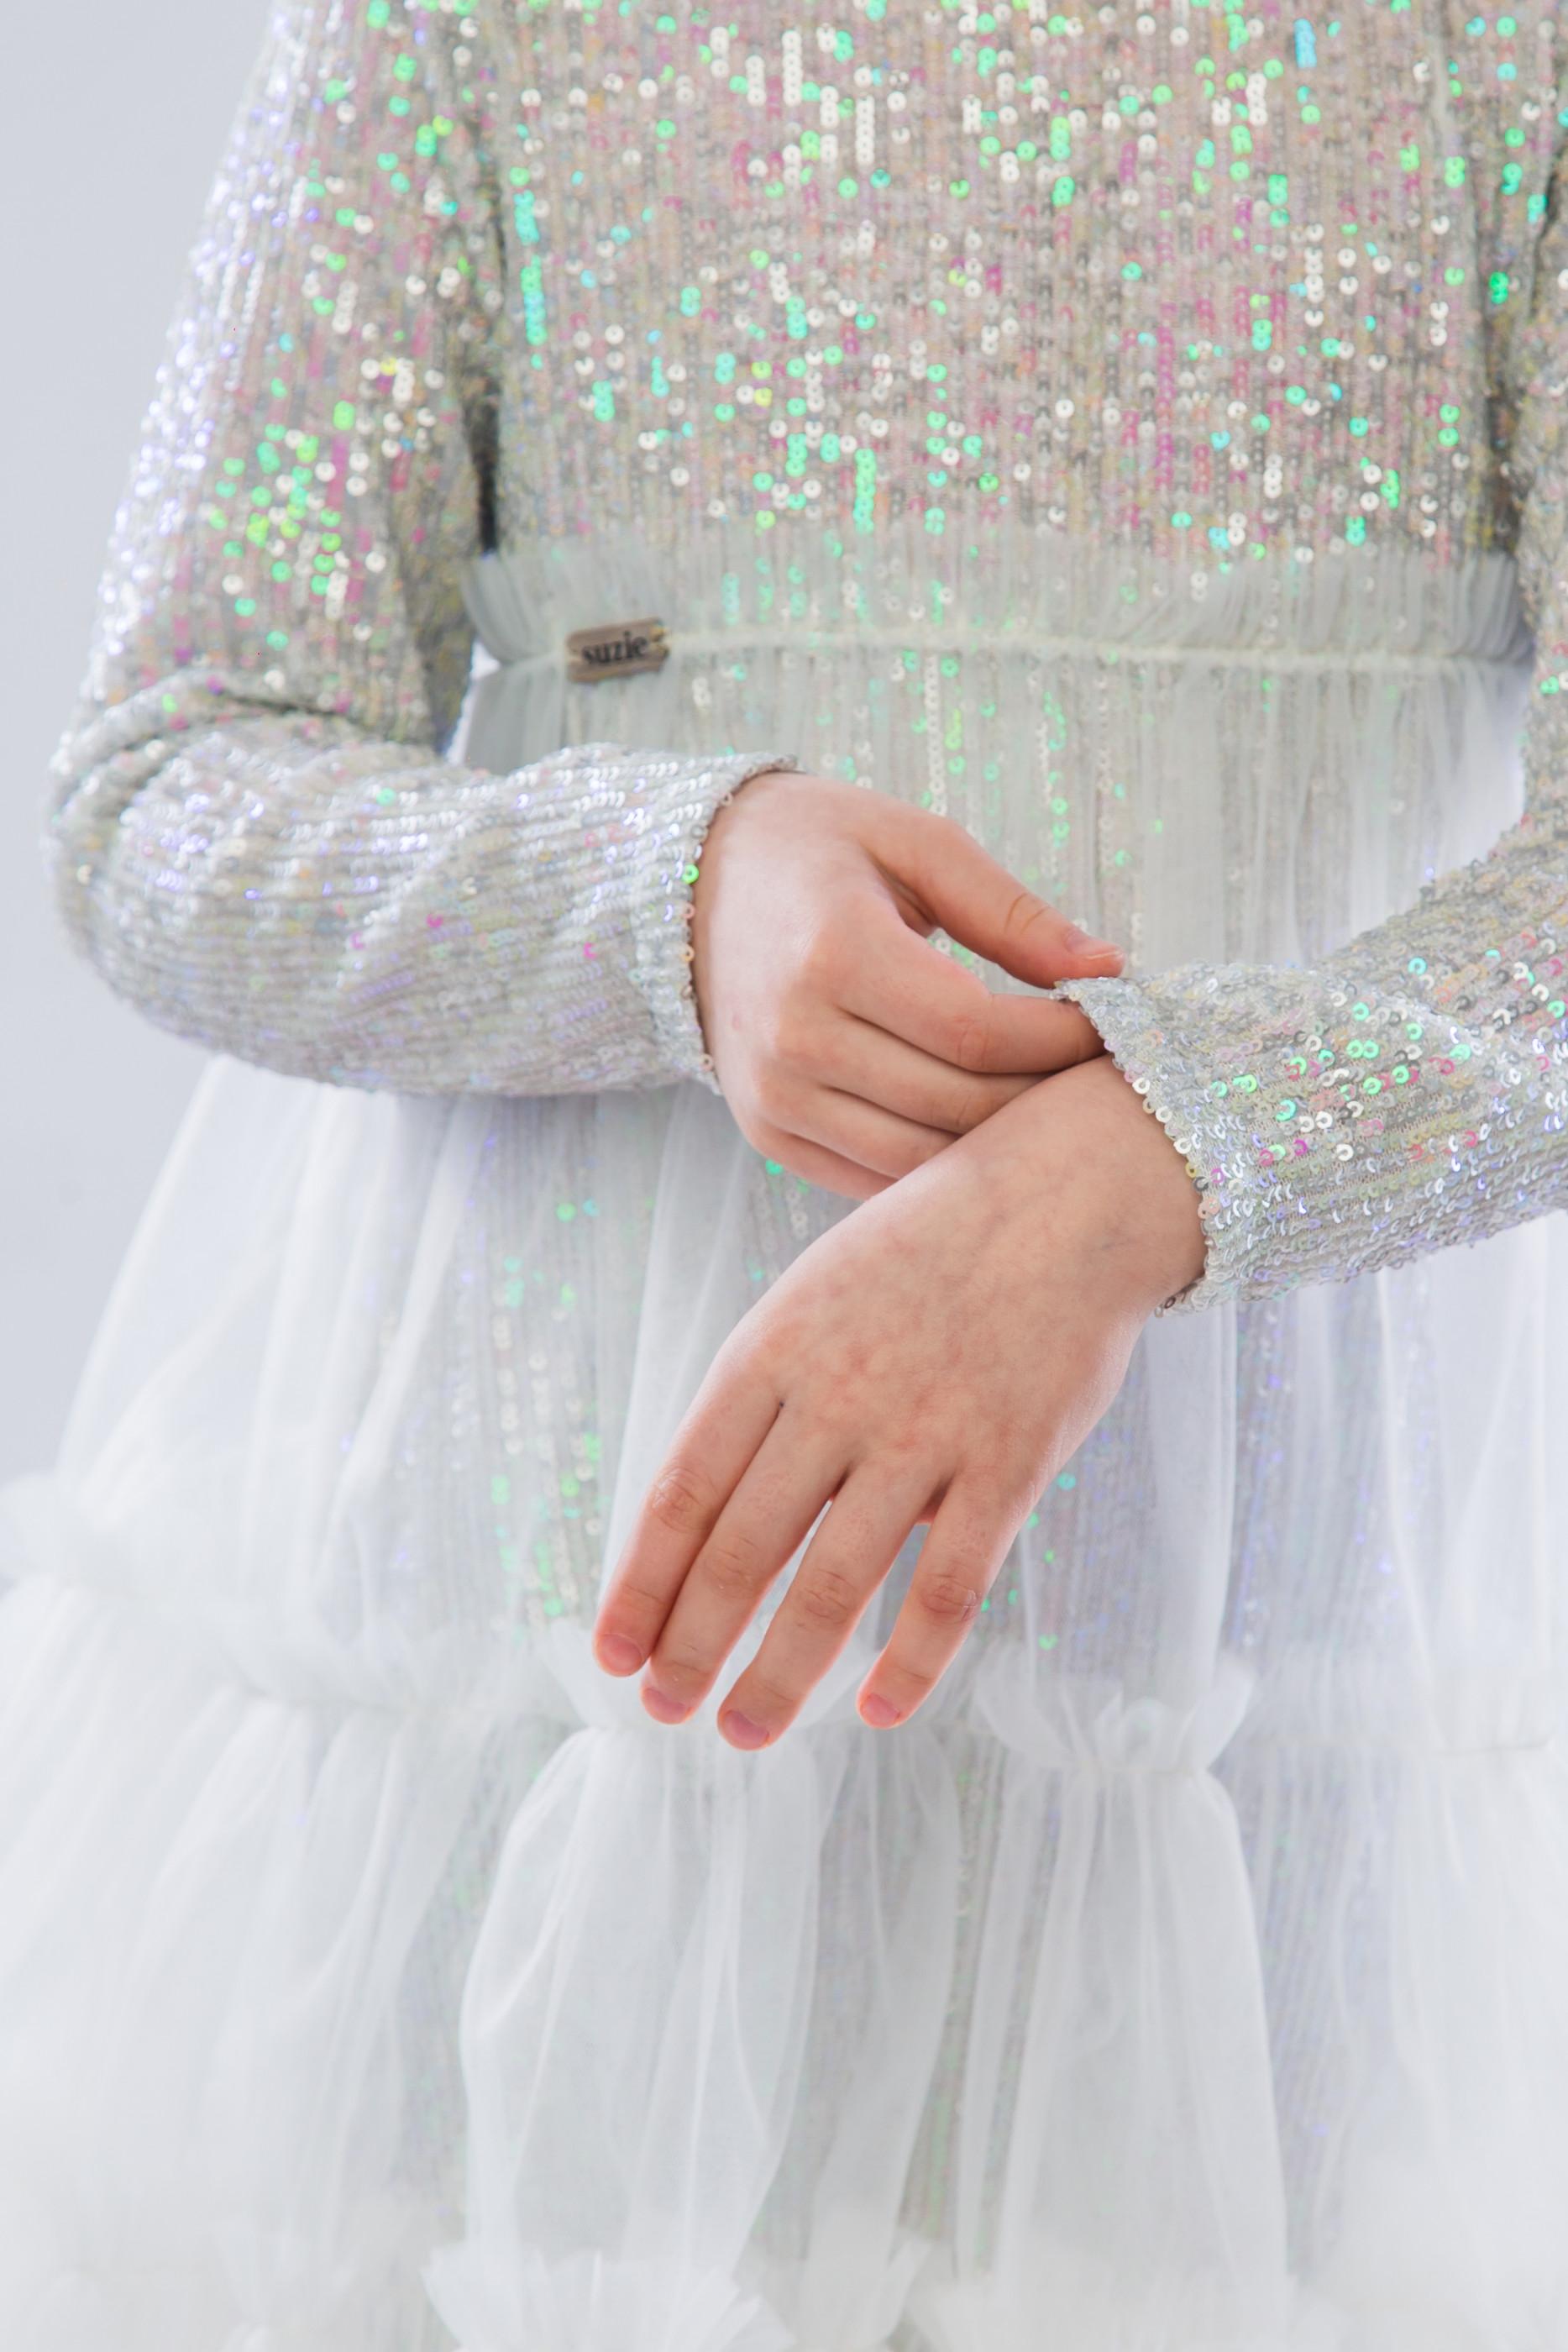 Плаття Андріана, фото №2